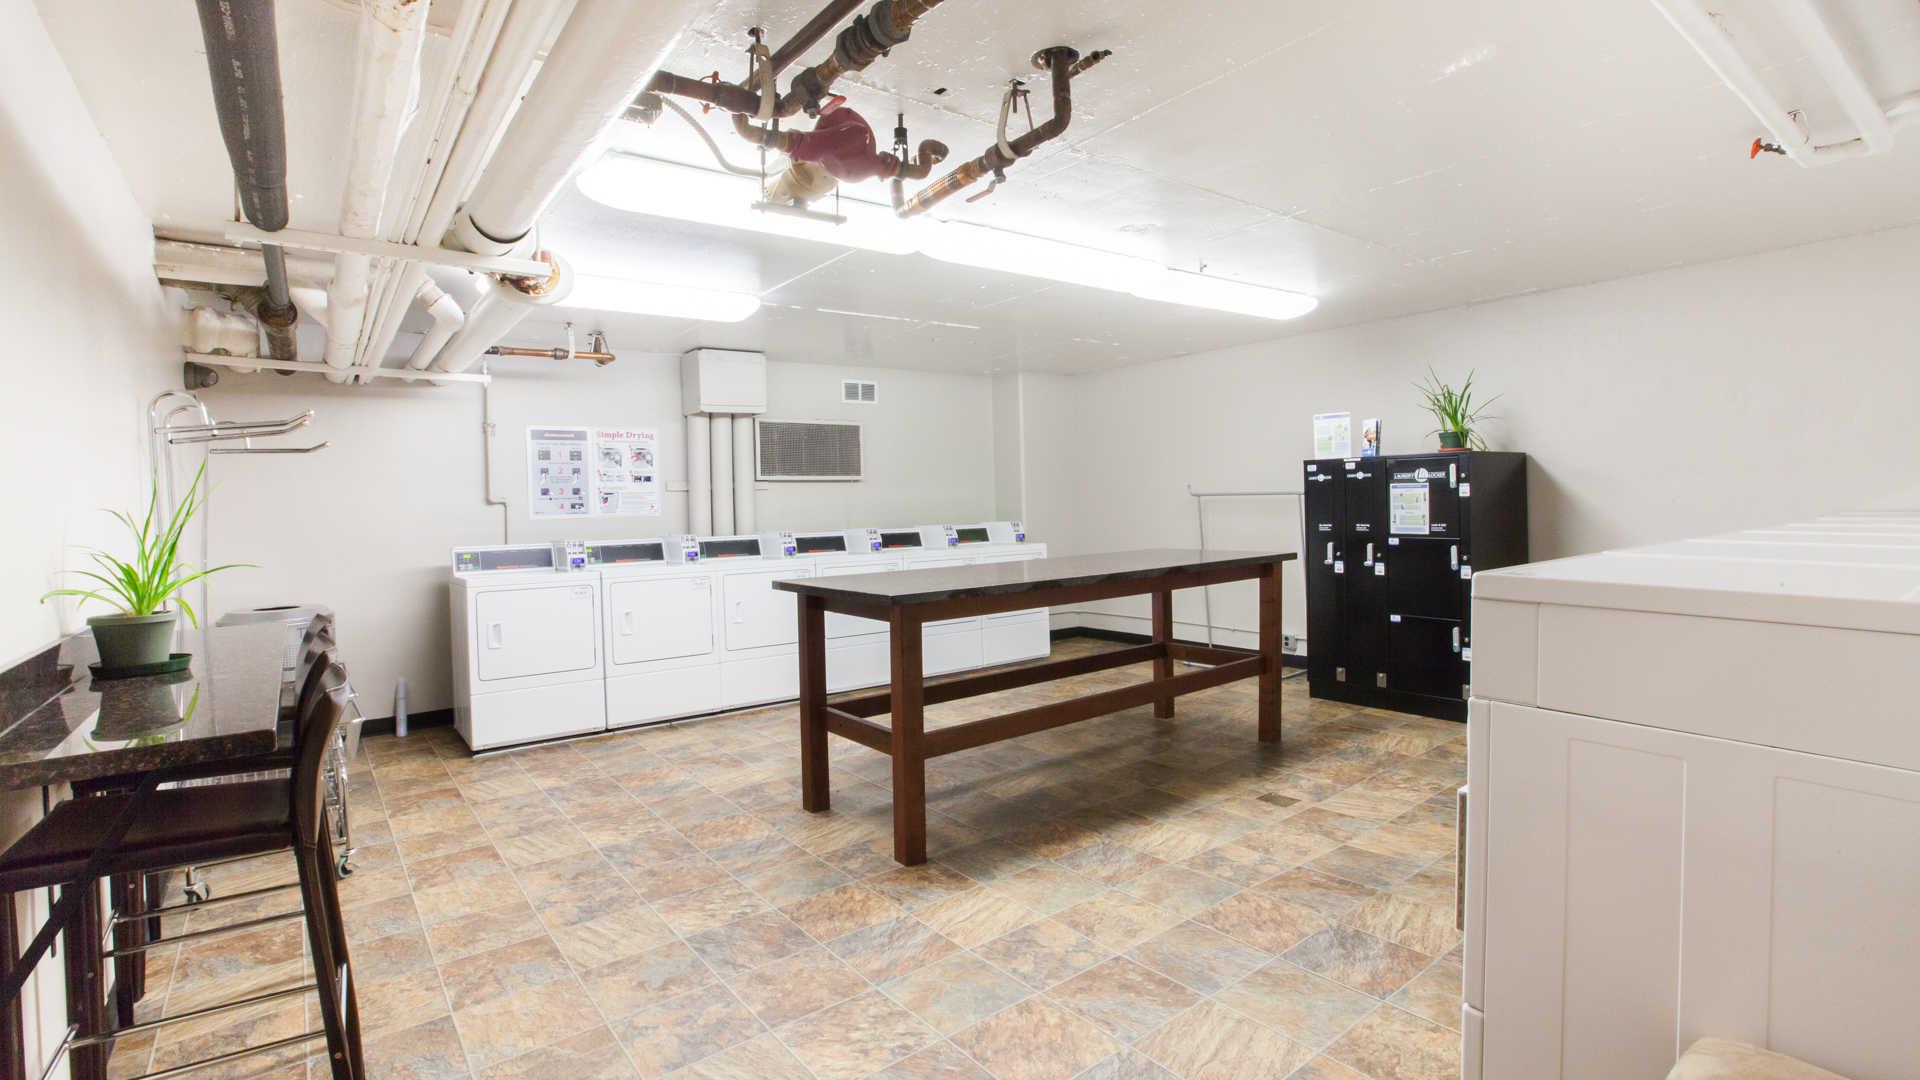 Apartment Laundry Room Design   mimiku